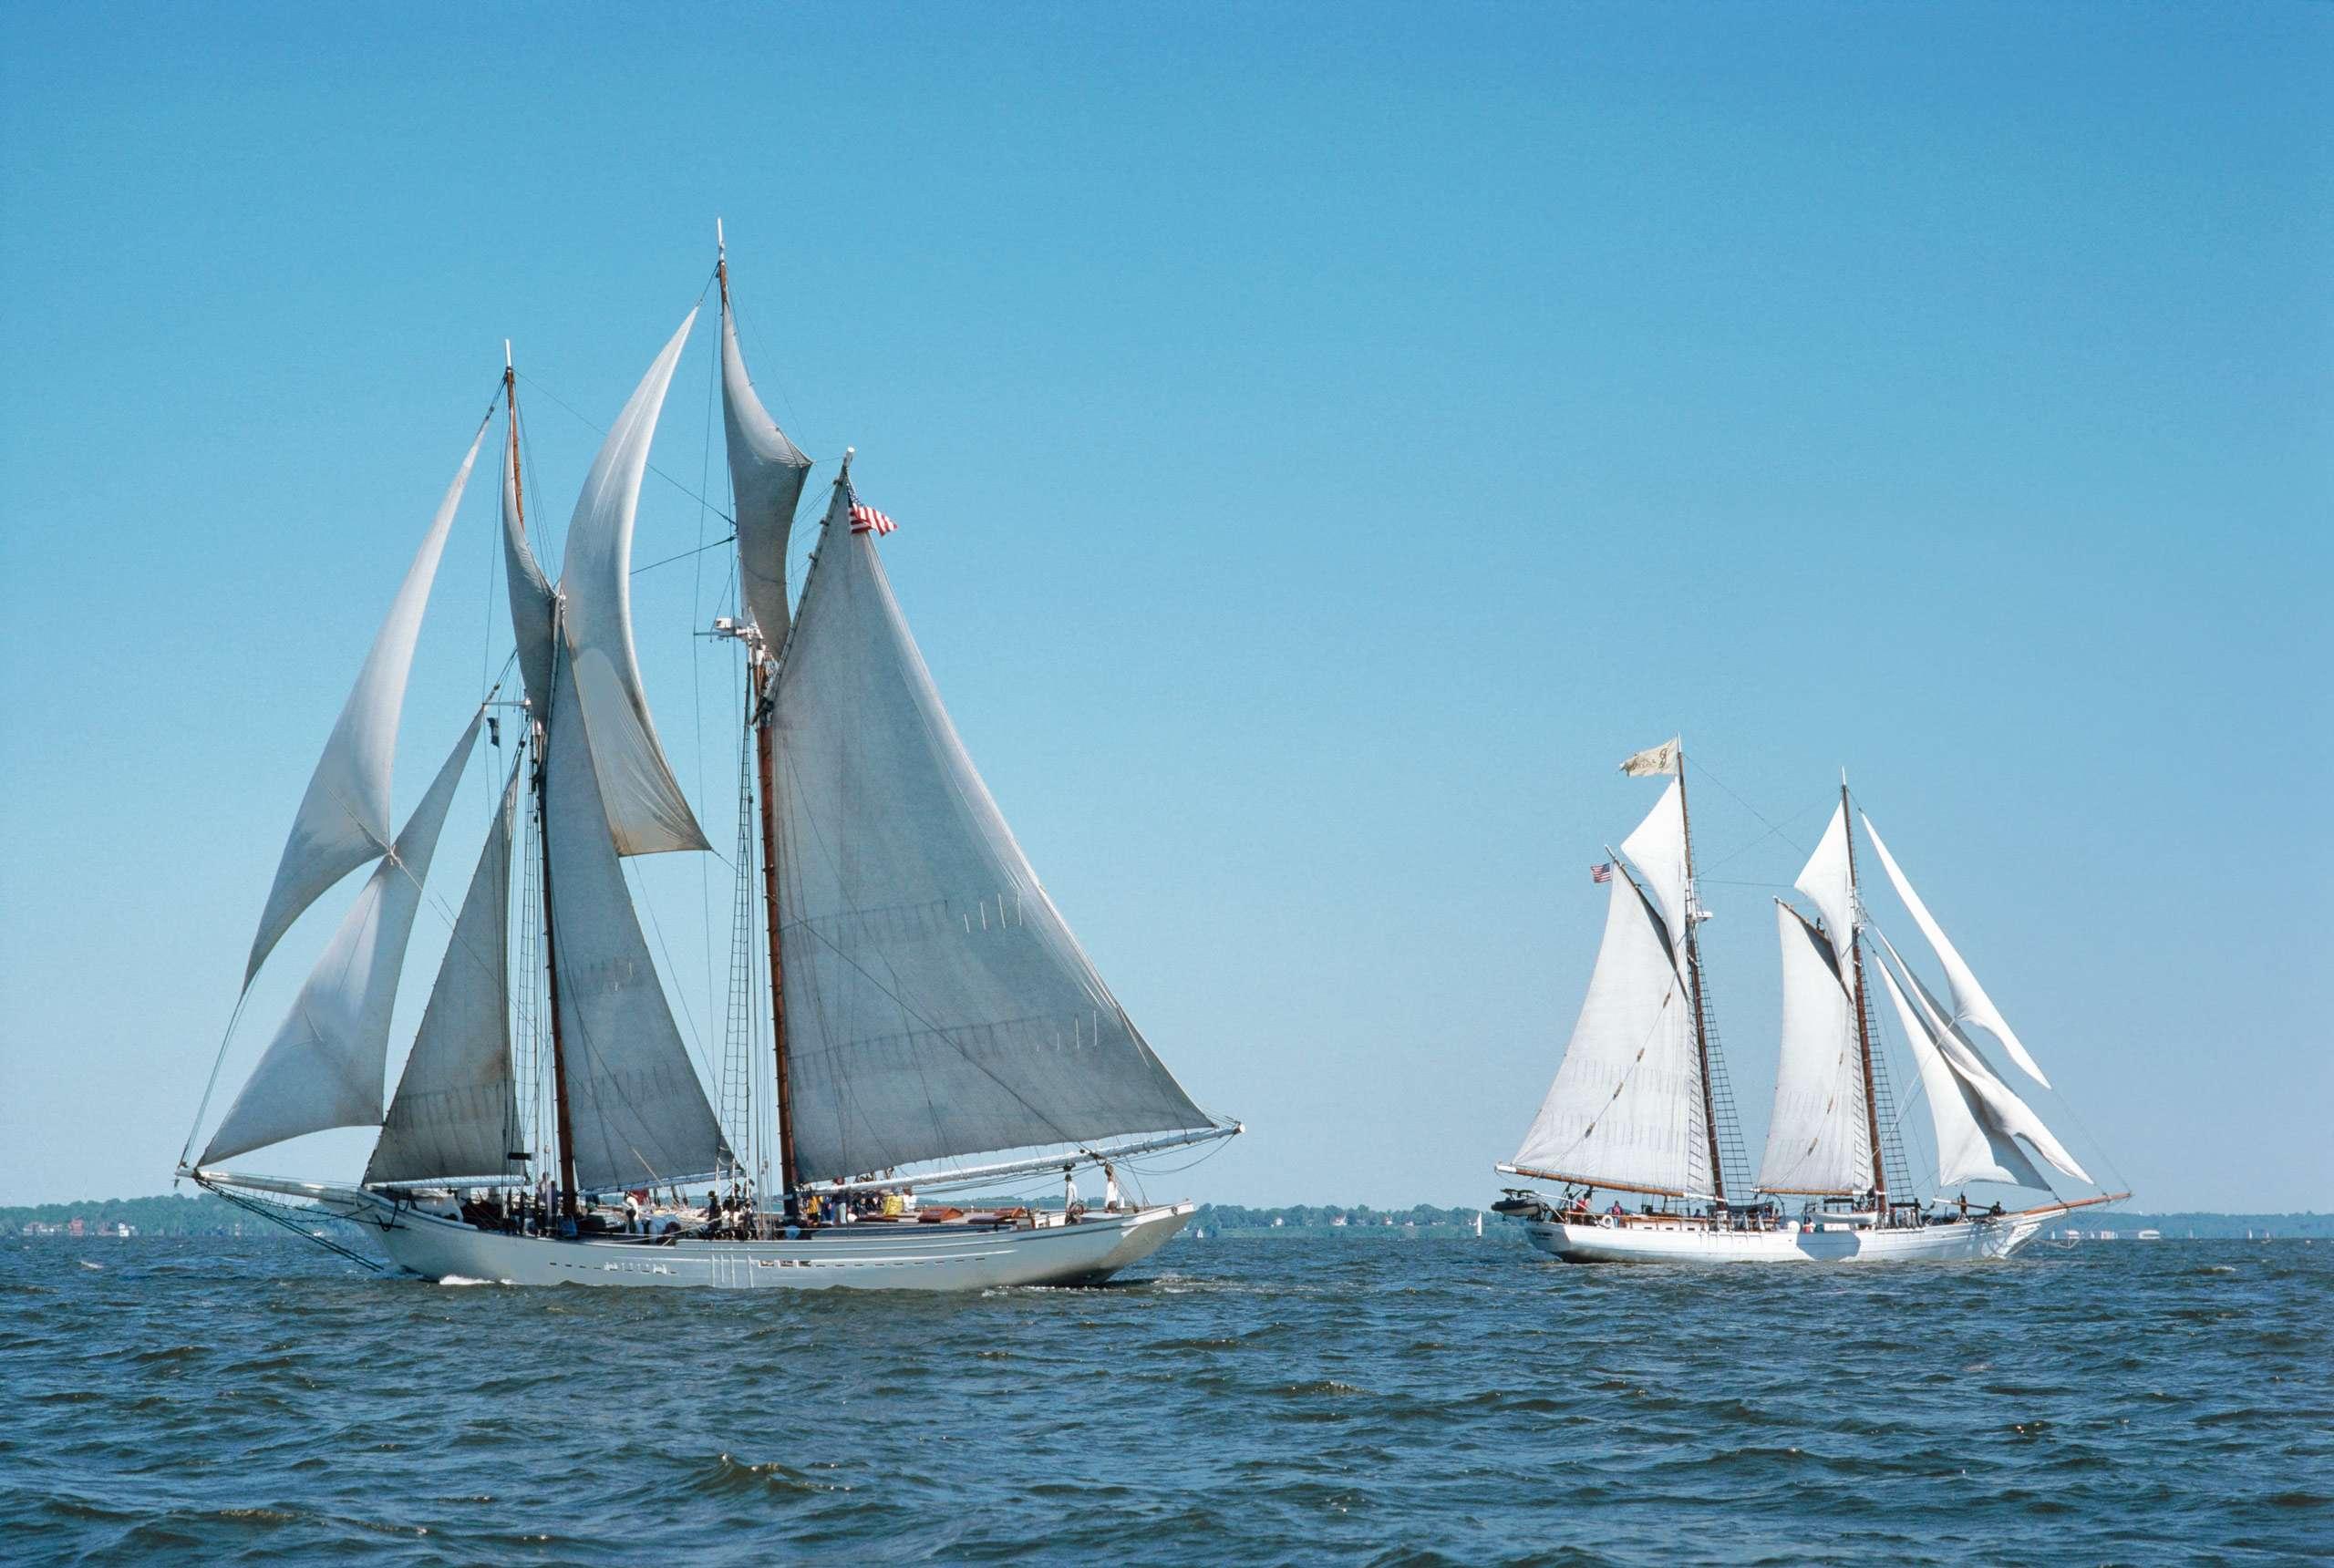 PORTFOLIO - Sailing - Windjammers #26   PCG419